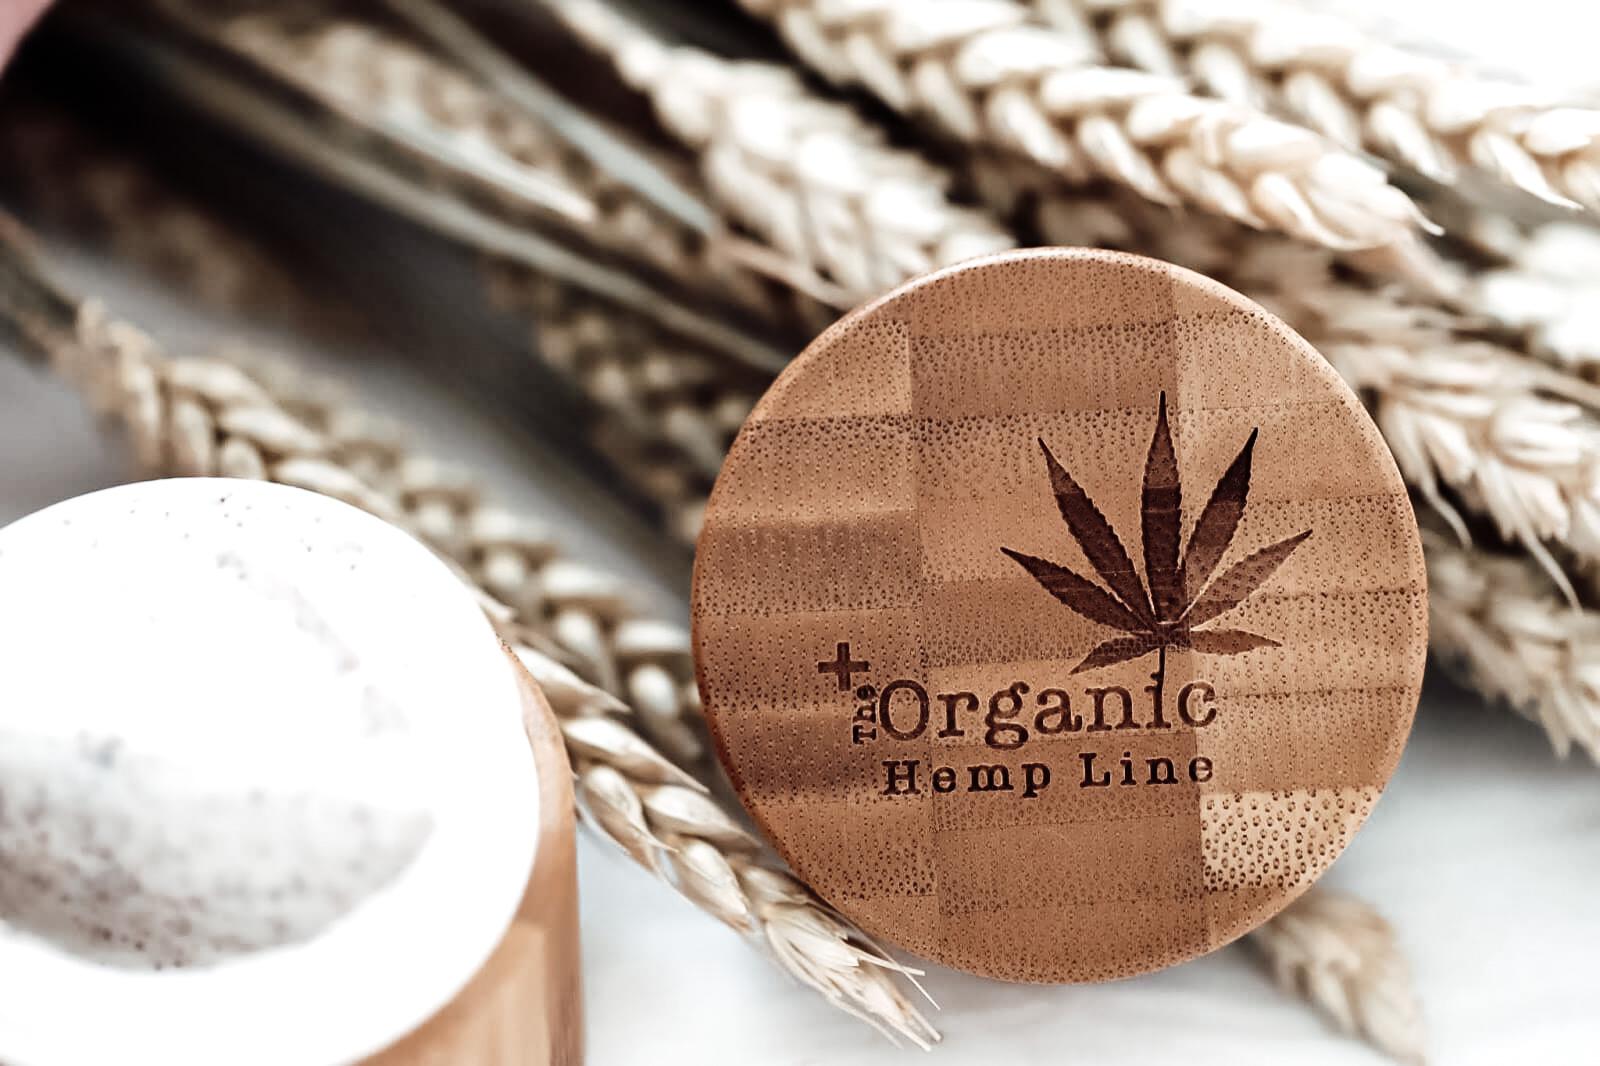 The Organic Hemp Line Soins au Chanvre avis